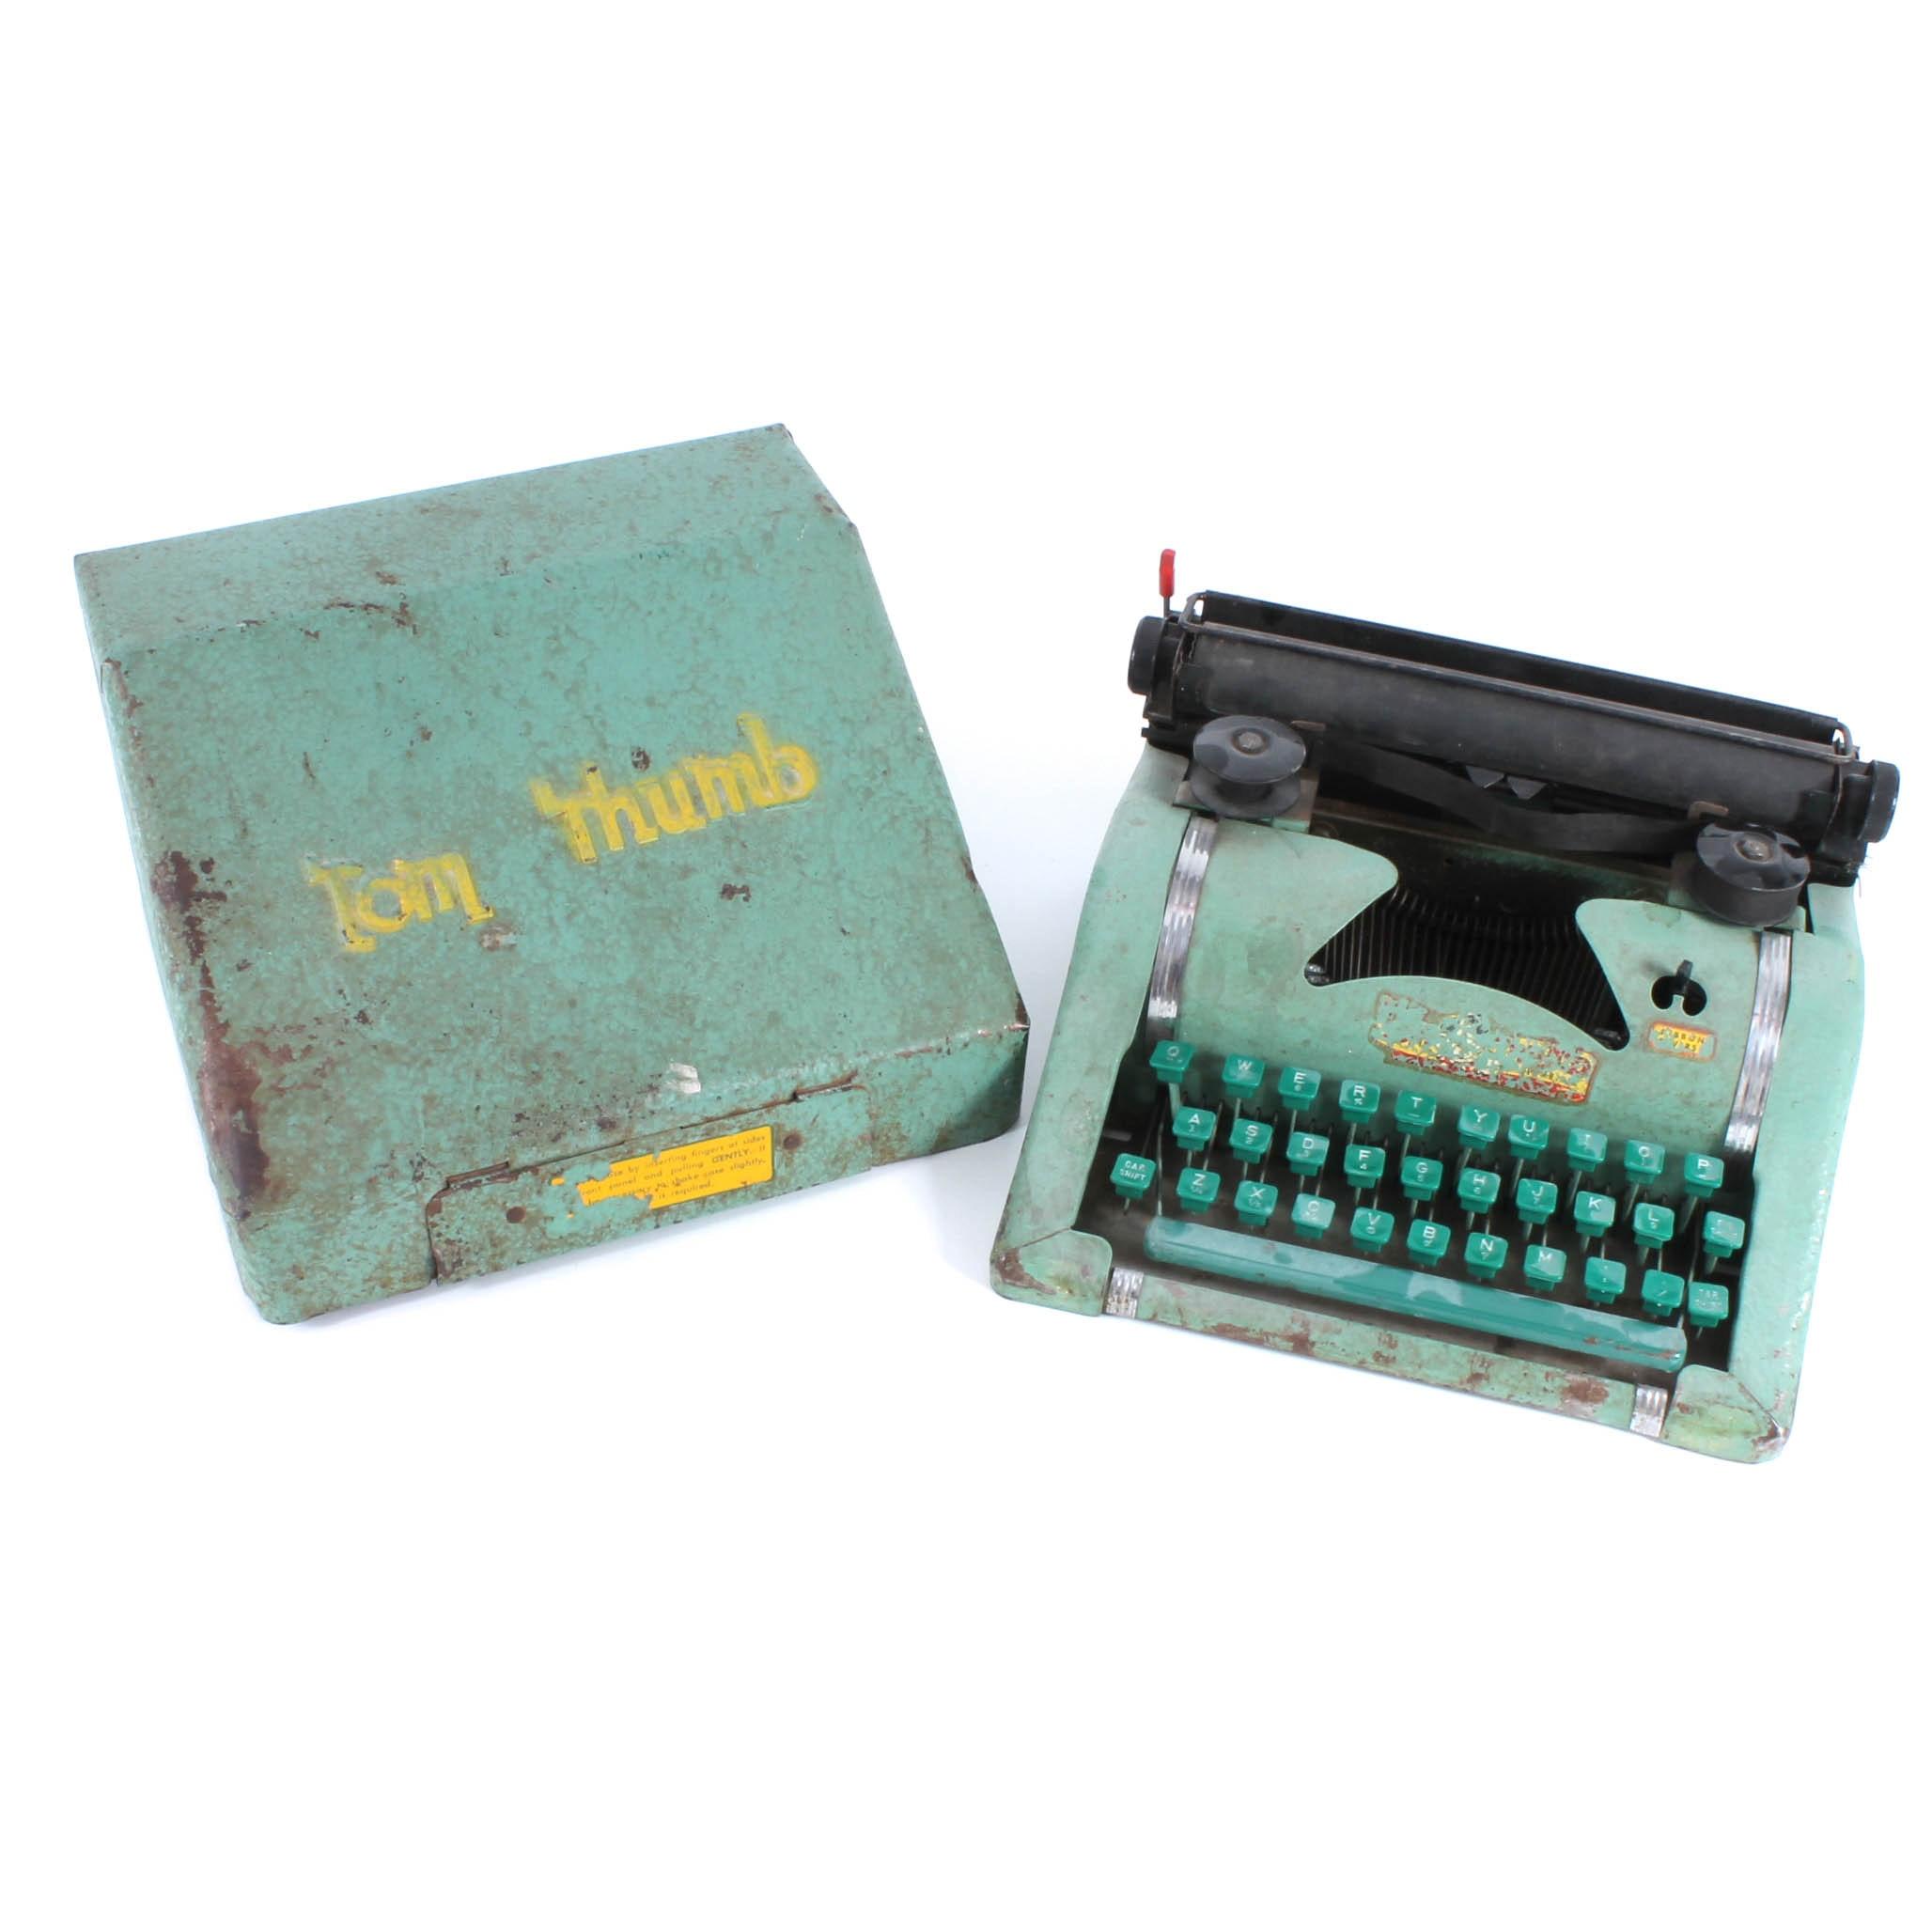 Vintage Tom Thumb Child's Typewriter